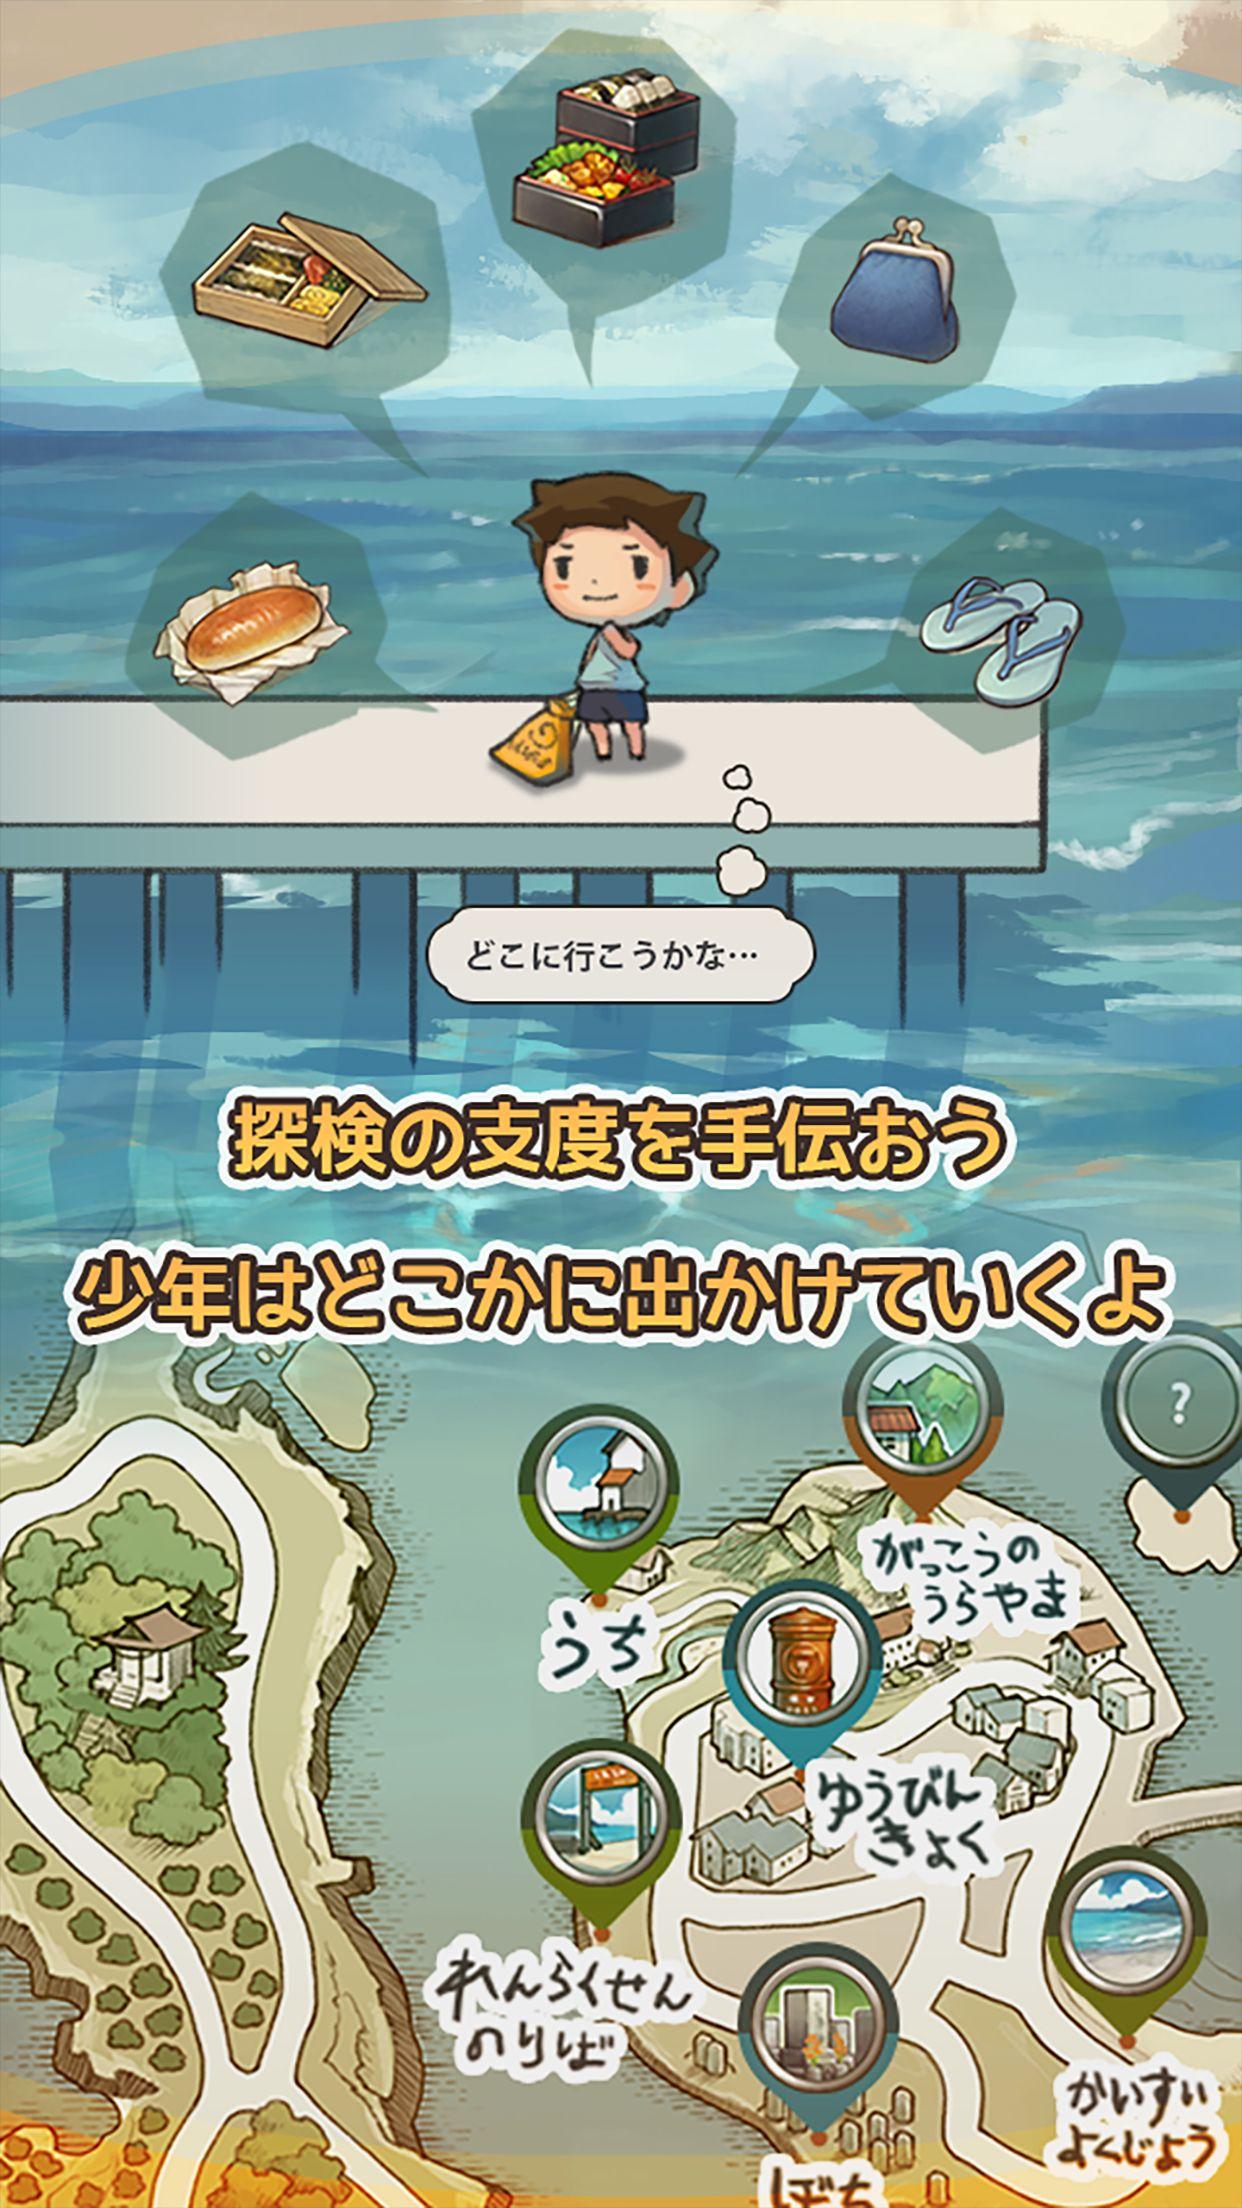 GAGEXのアプリが全世界3,000万DLを達成!新作『あの頃の夏休み』も好評配信中!